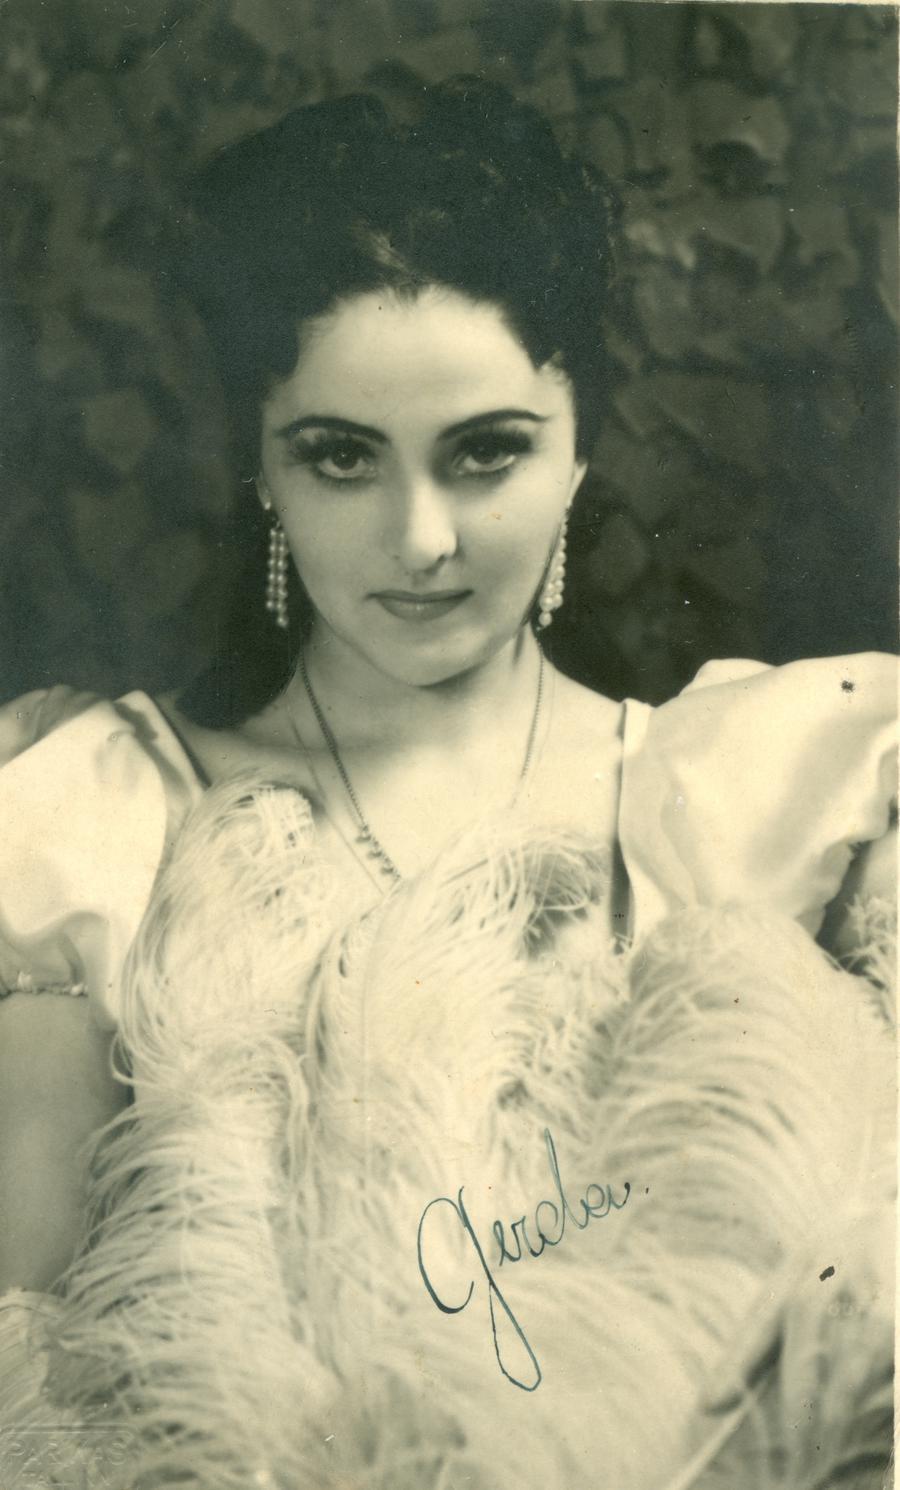 Gerda Murre